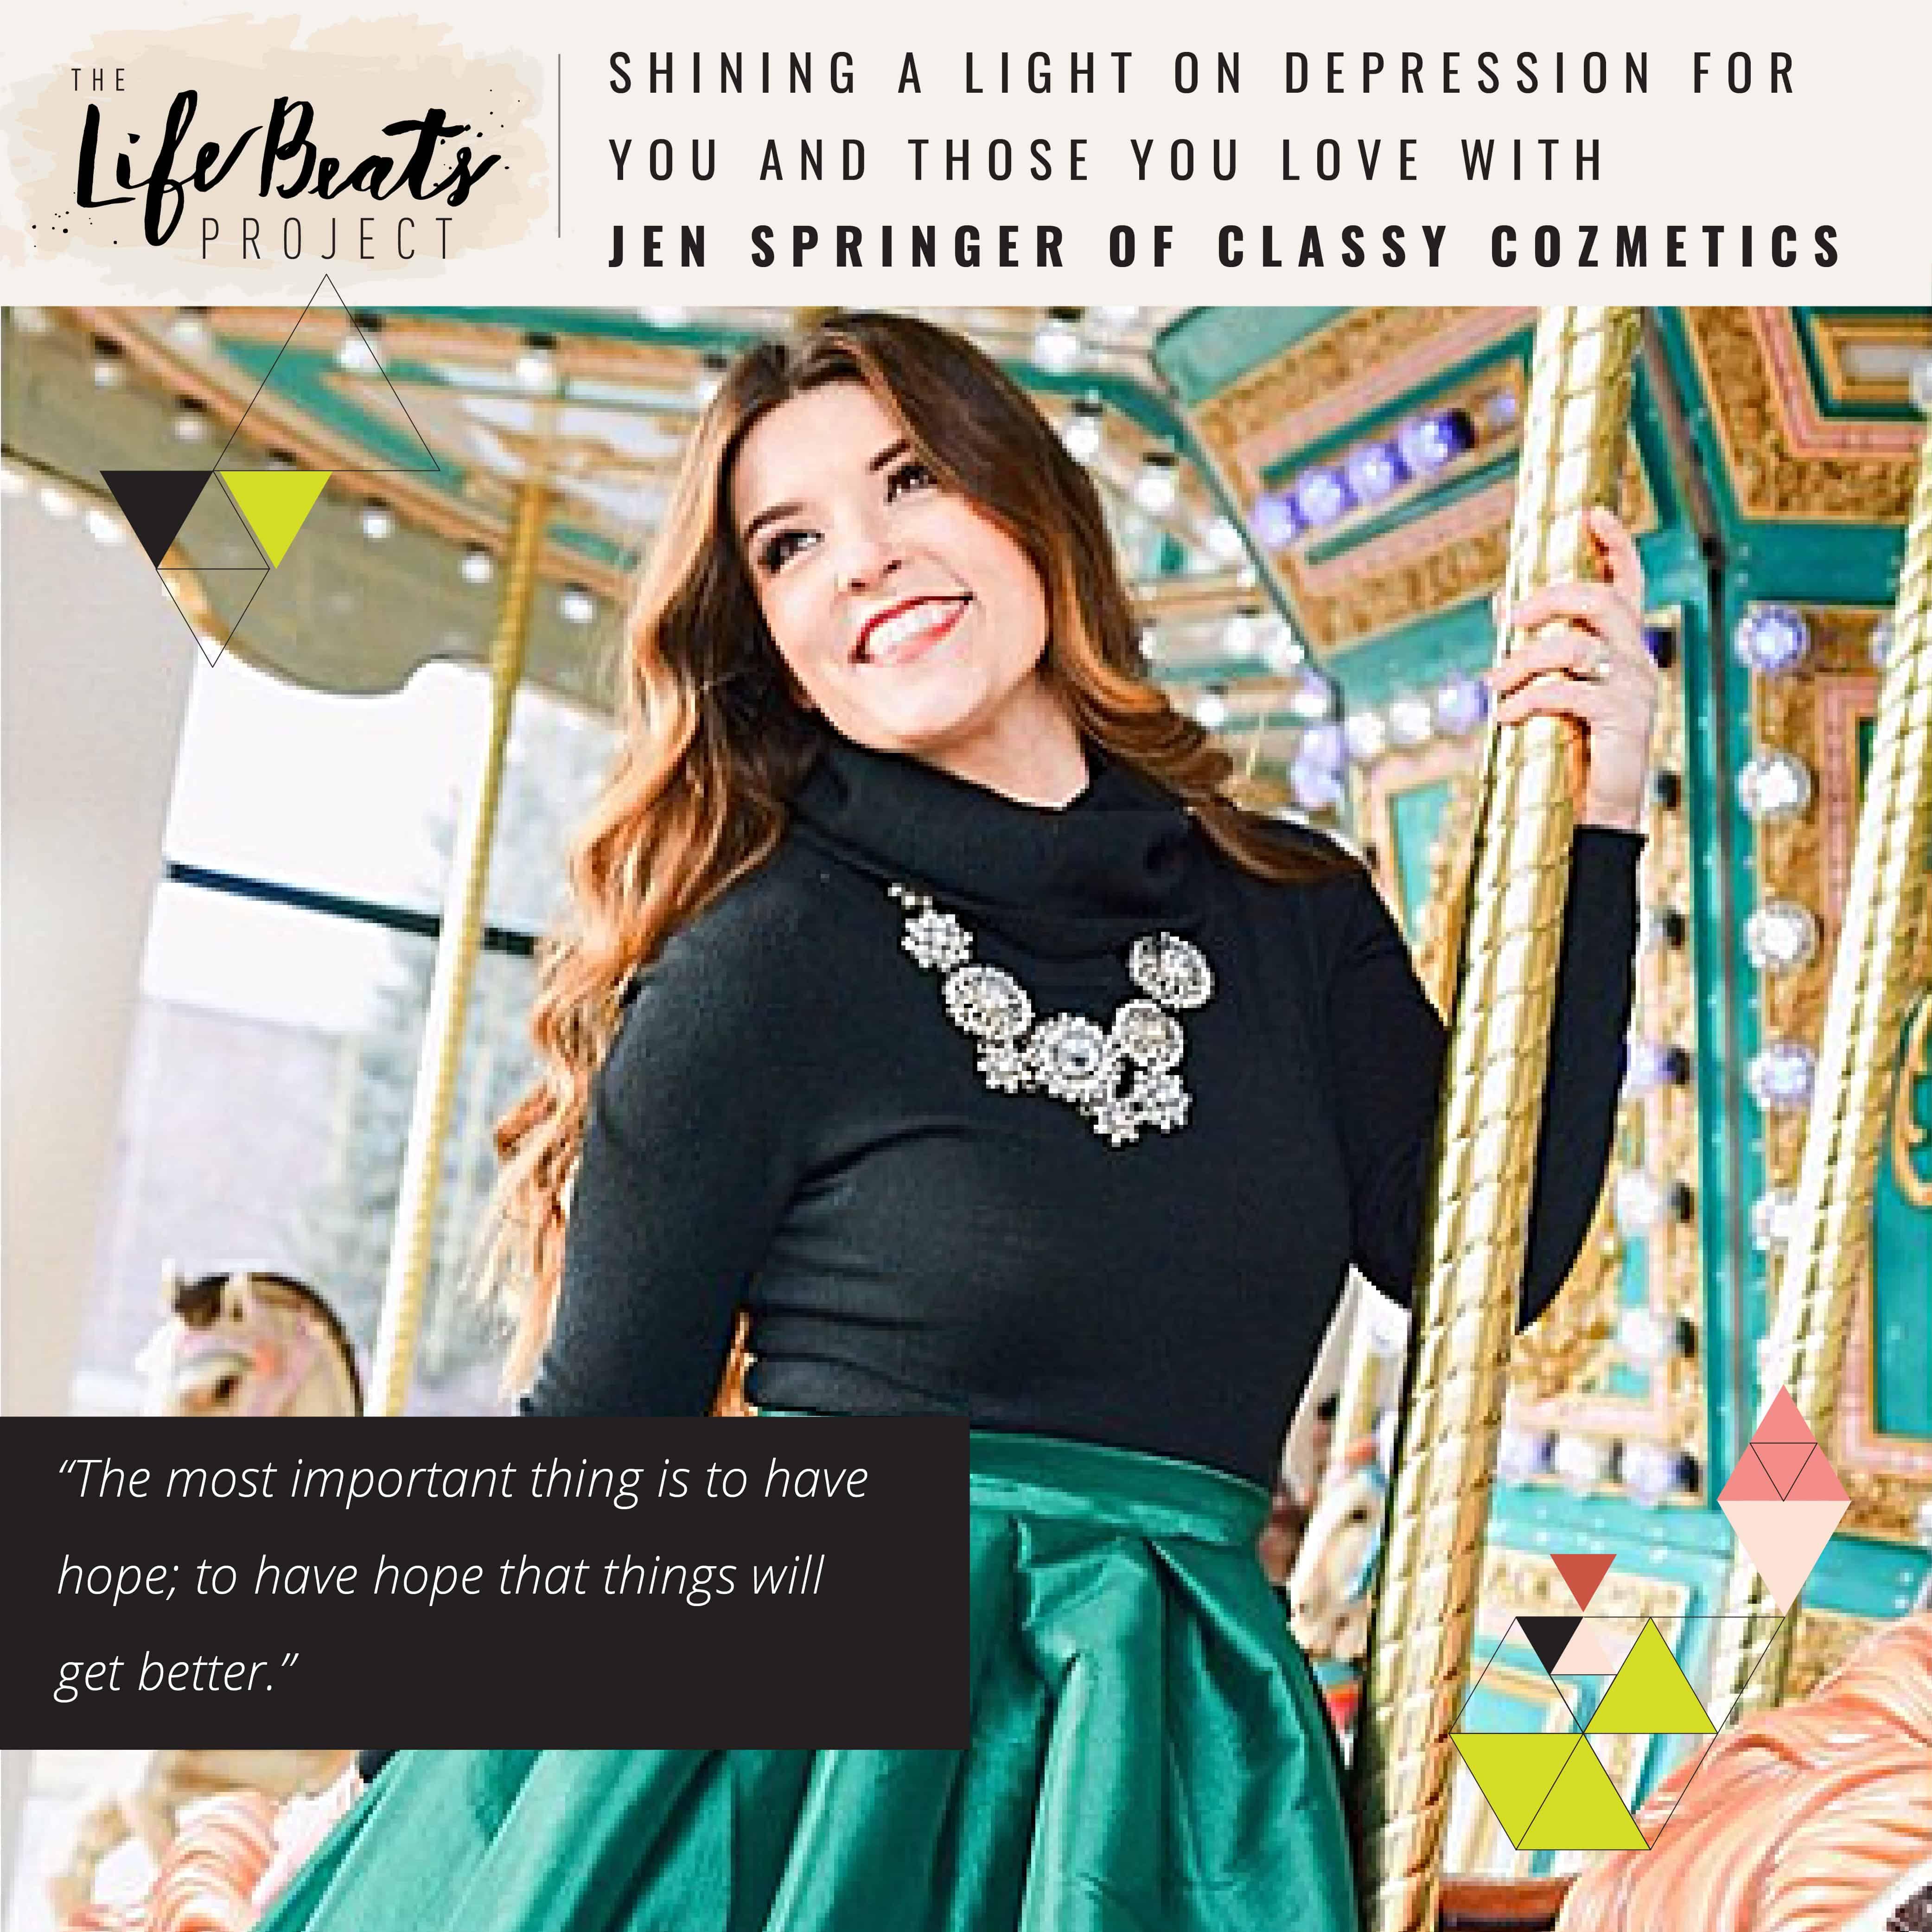 depression help Jen Springer The LifeBeats Project Podcast